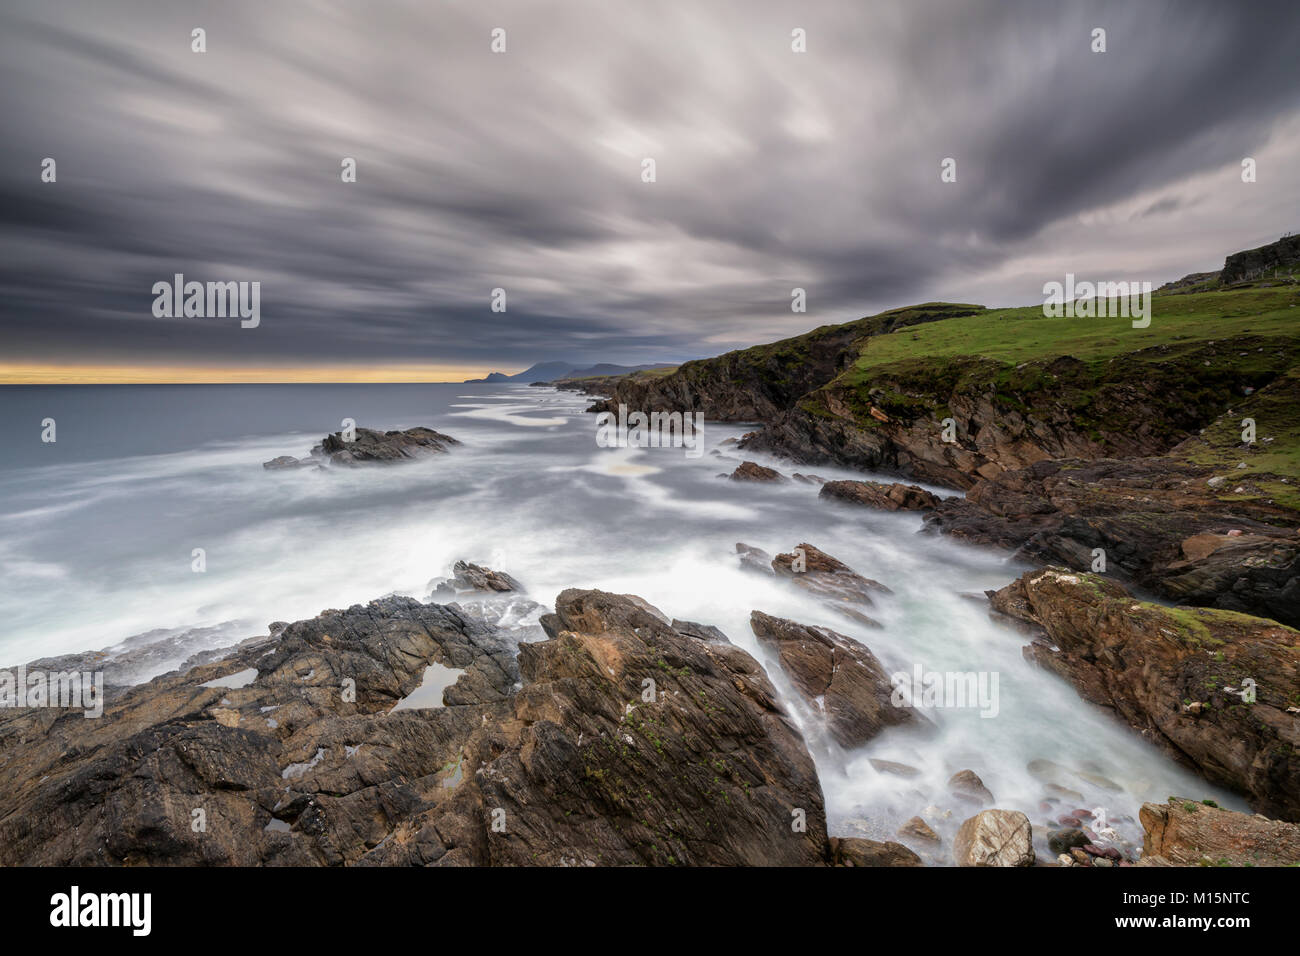 Coastline of Achill Island Ireland - Stock Image